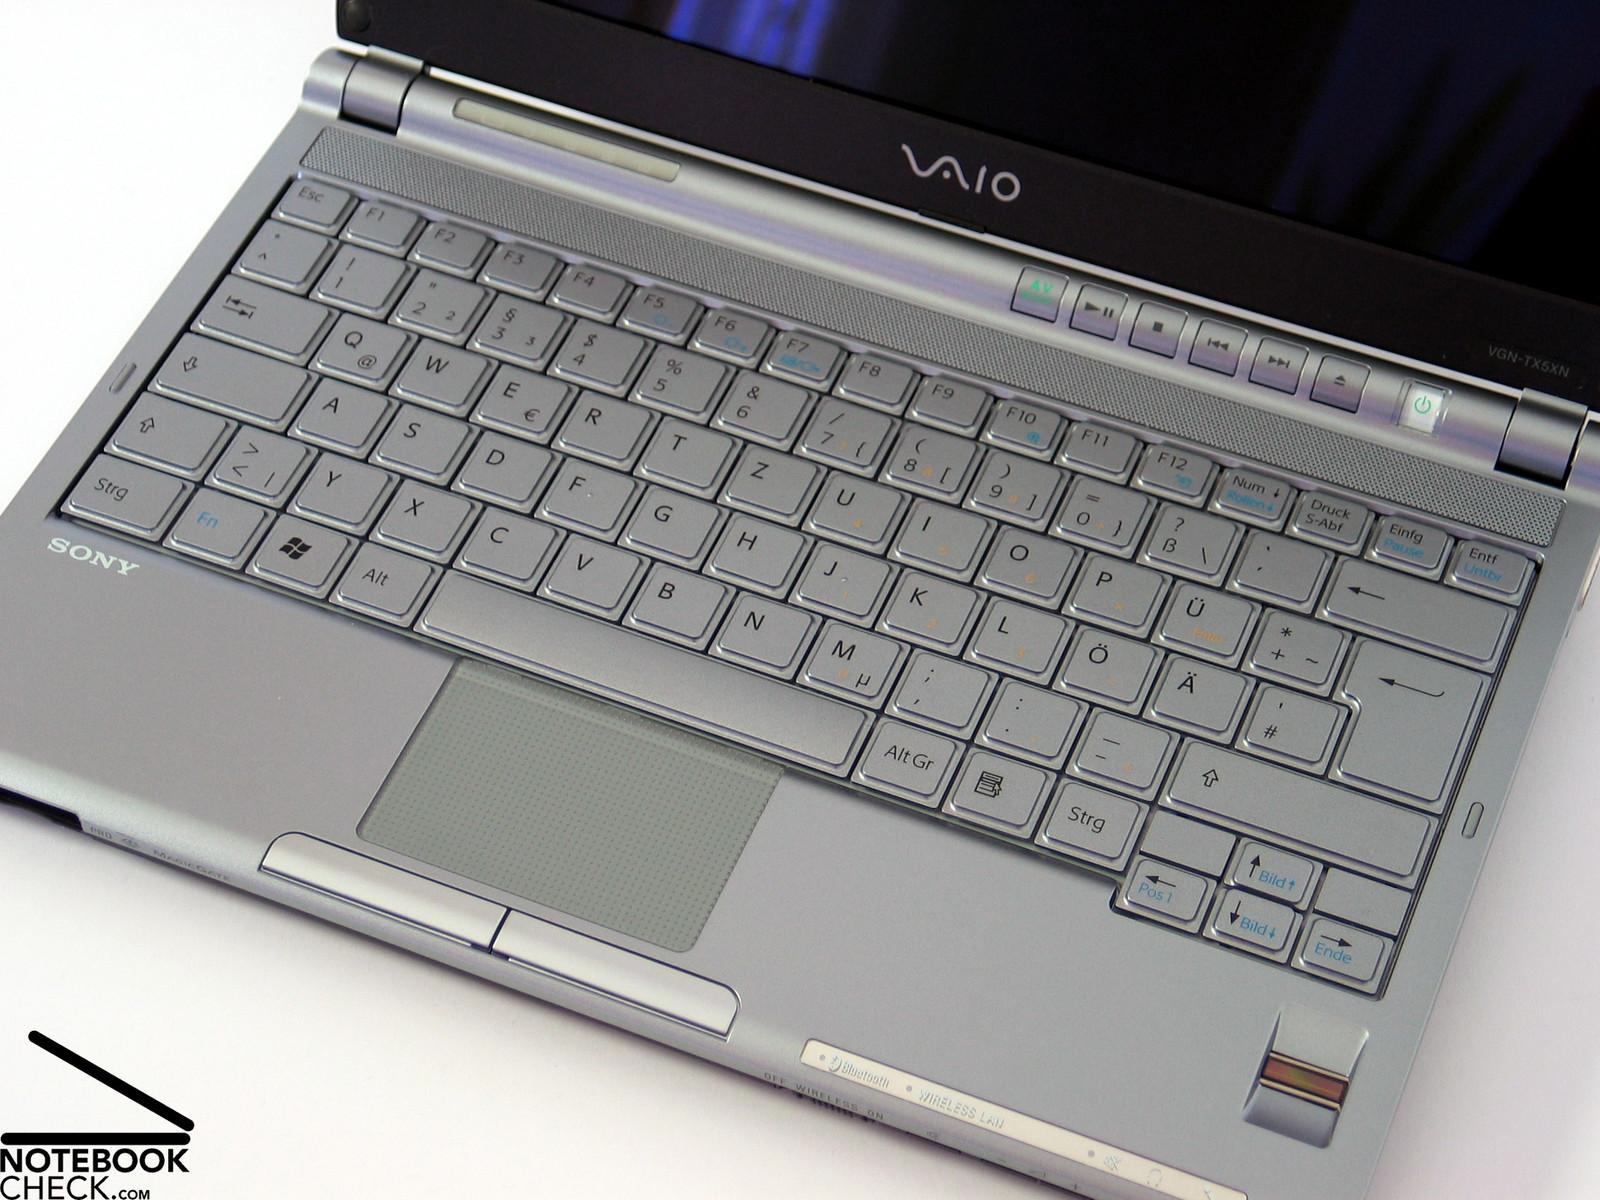 review sony vaio vgn tx5xn notebook notebookcheck net diagram of keyboard keys diagram of keyboard keys diagram of keyboard keys diagram of keyboard keys